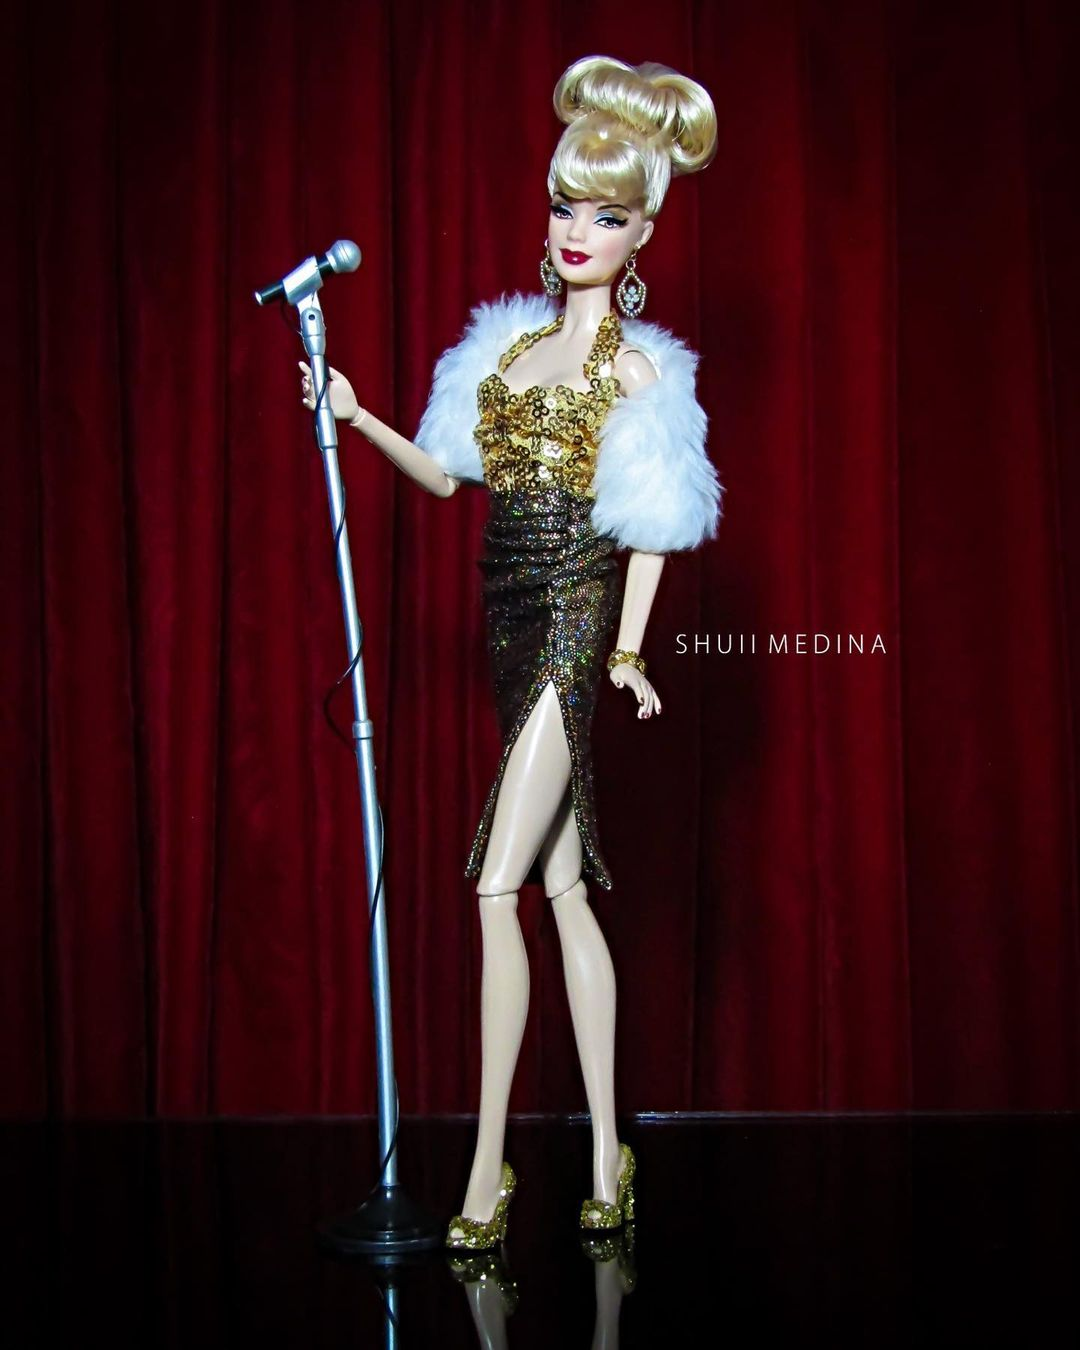 Bling Dolls Gold and Black Sequin Strap Short Dress with High Slit